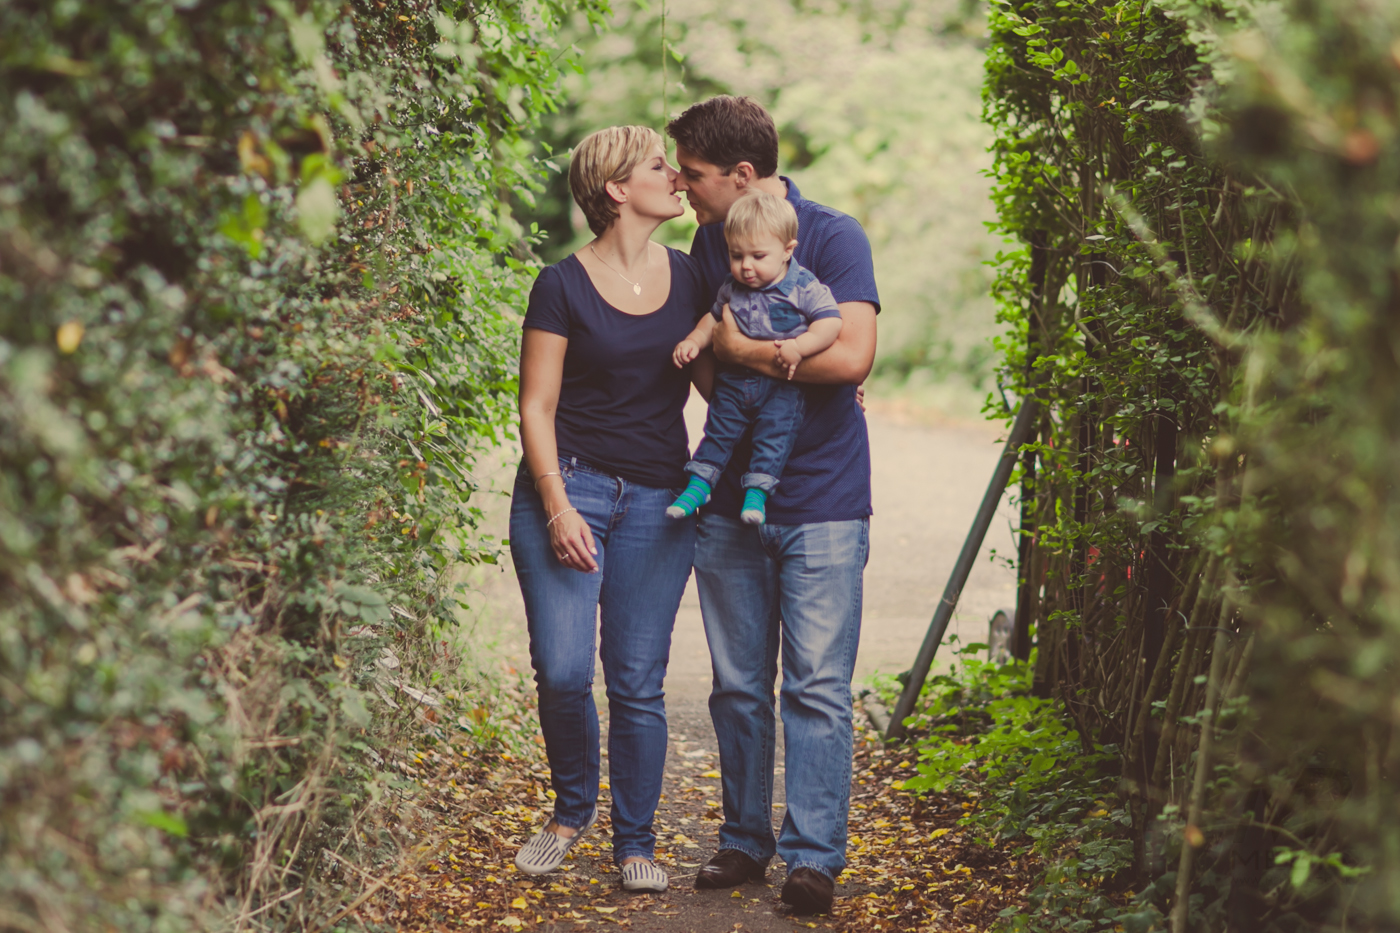 020 - Kelly, Matthew and Hugo Fine Art Family Photography by www.mpmedia.co.uk -108.JPG